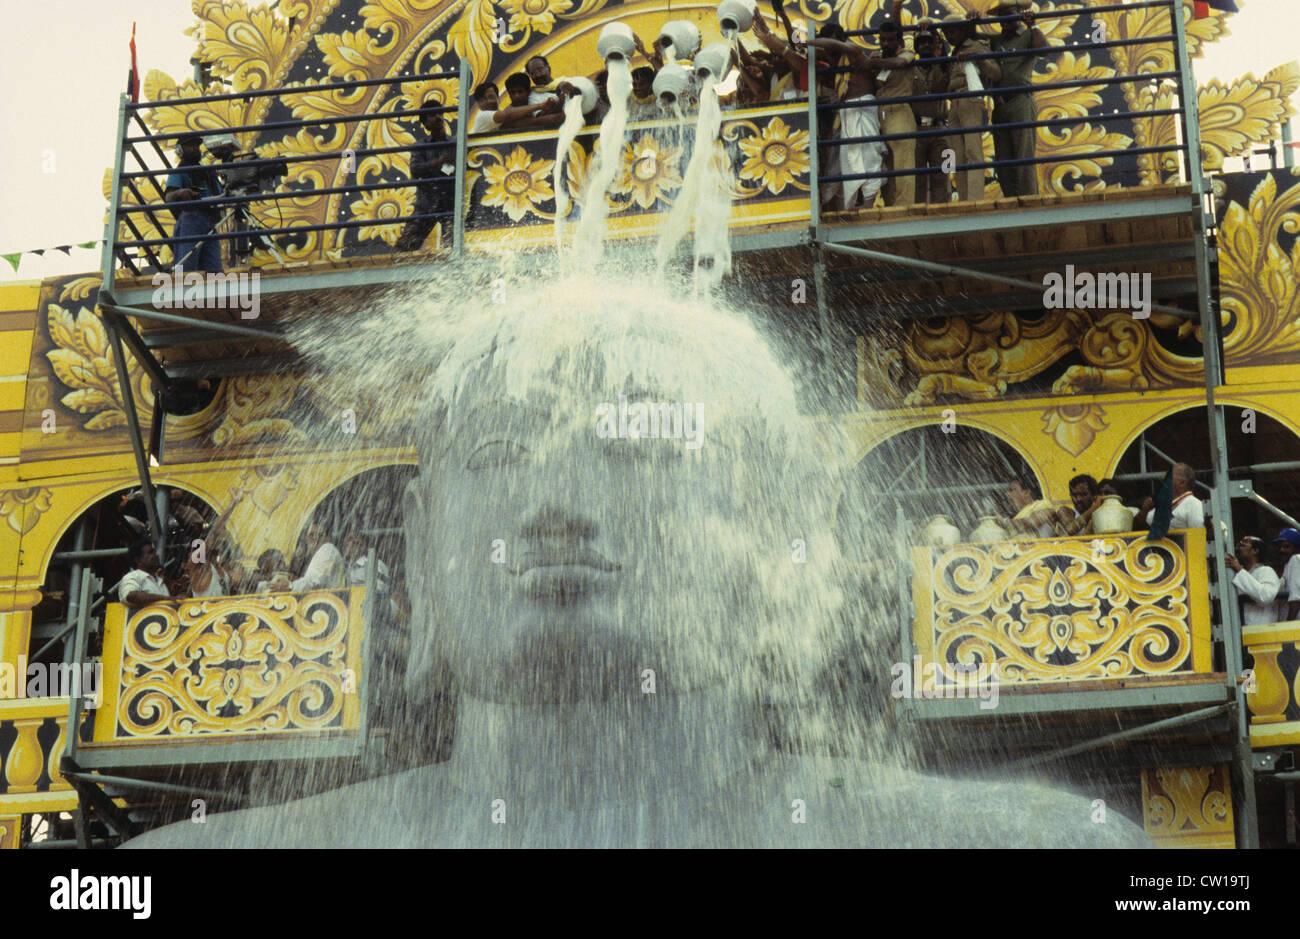 Sravana Stock Photos & Sravana Stock Images - Alamy